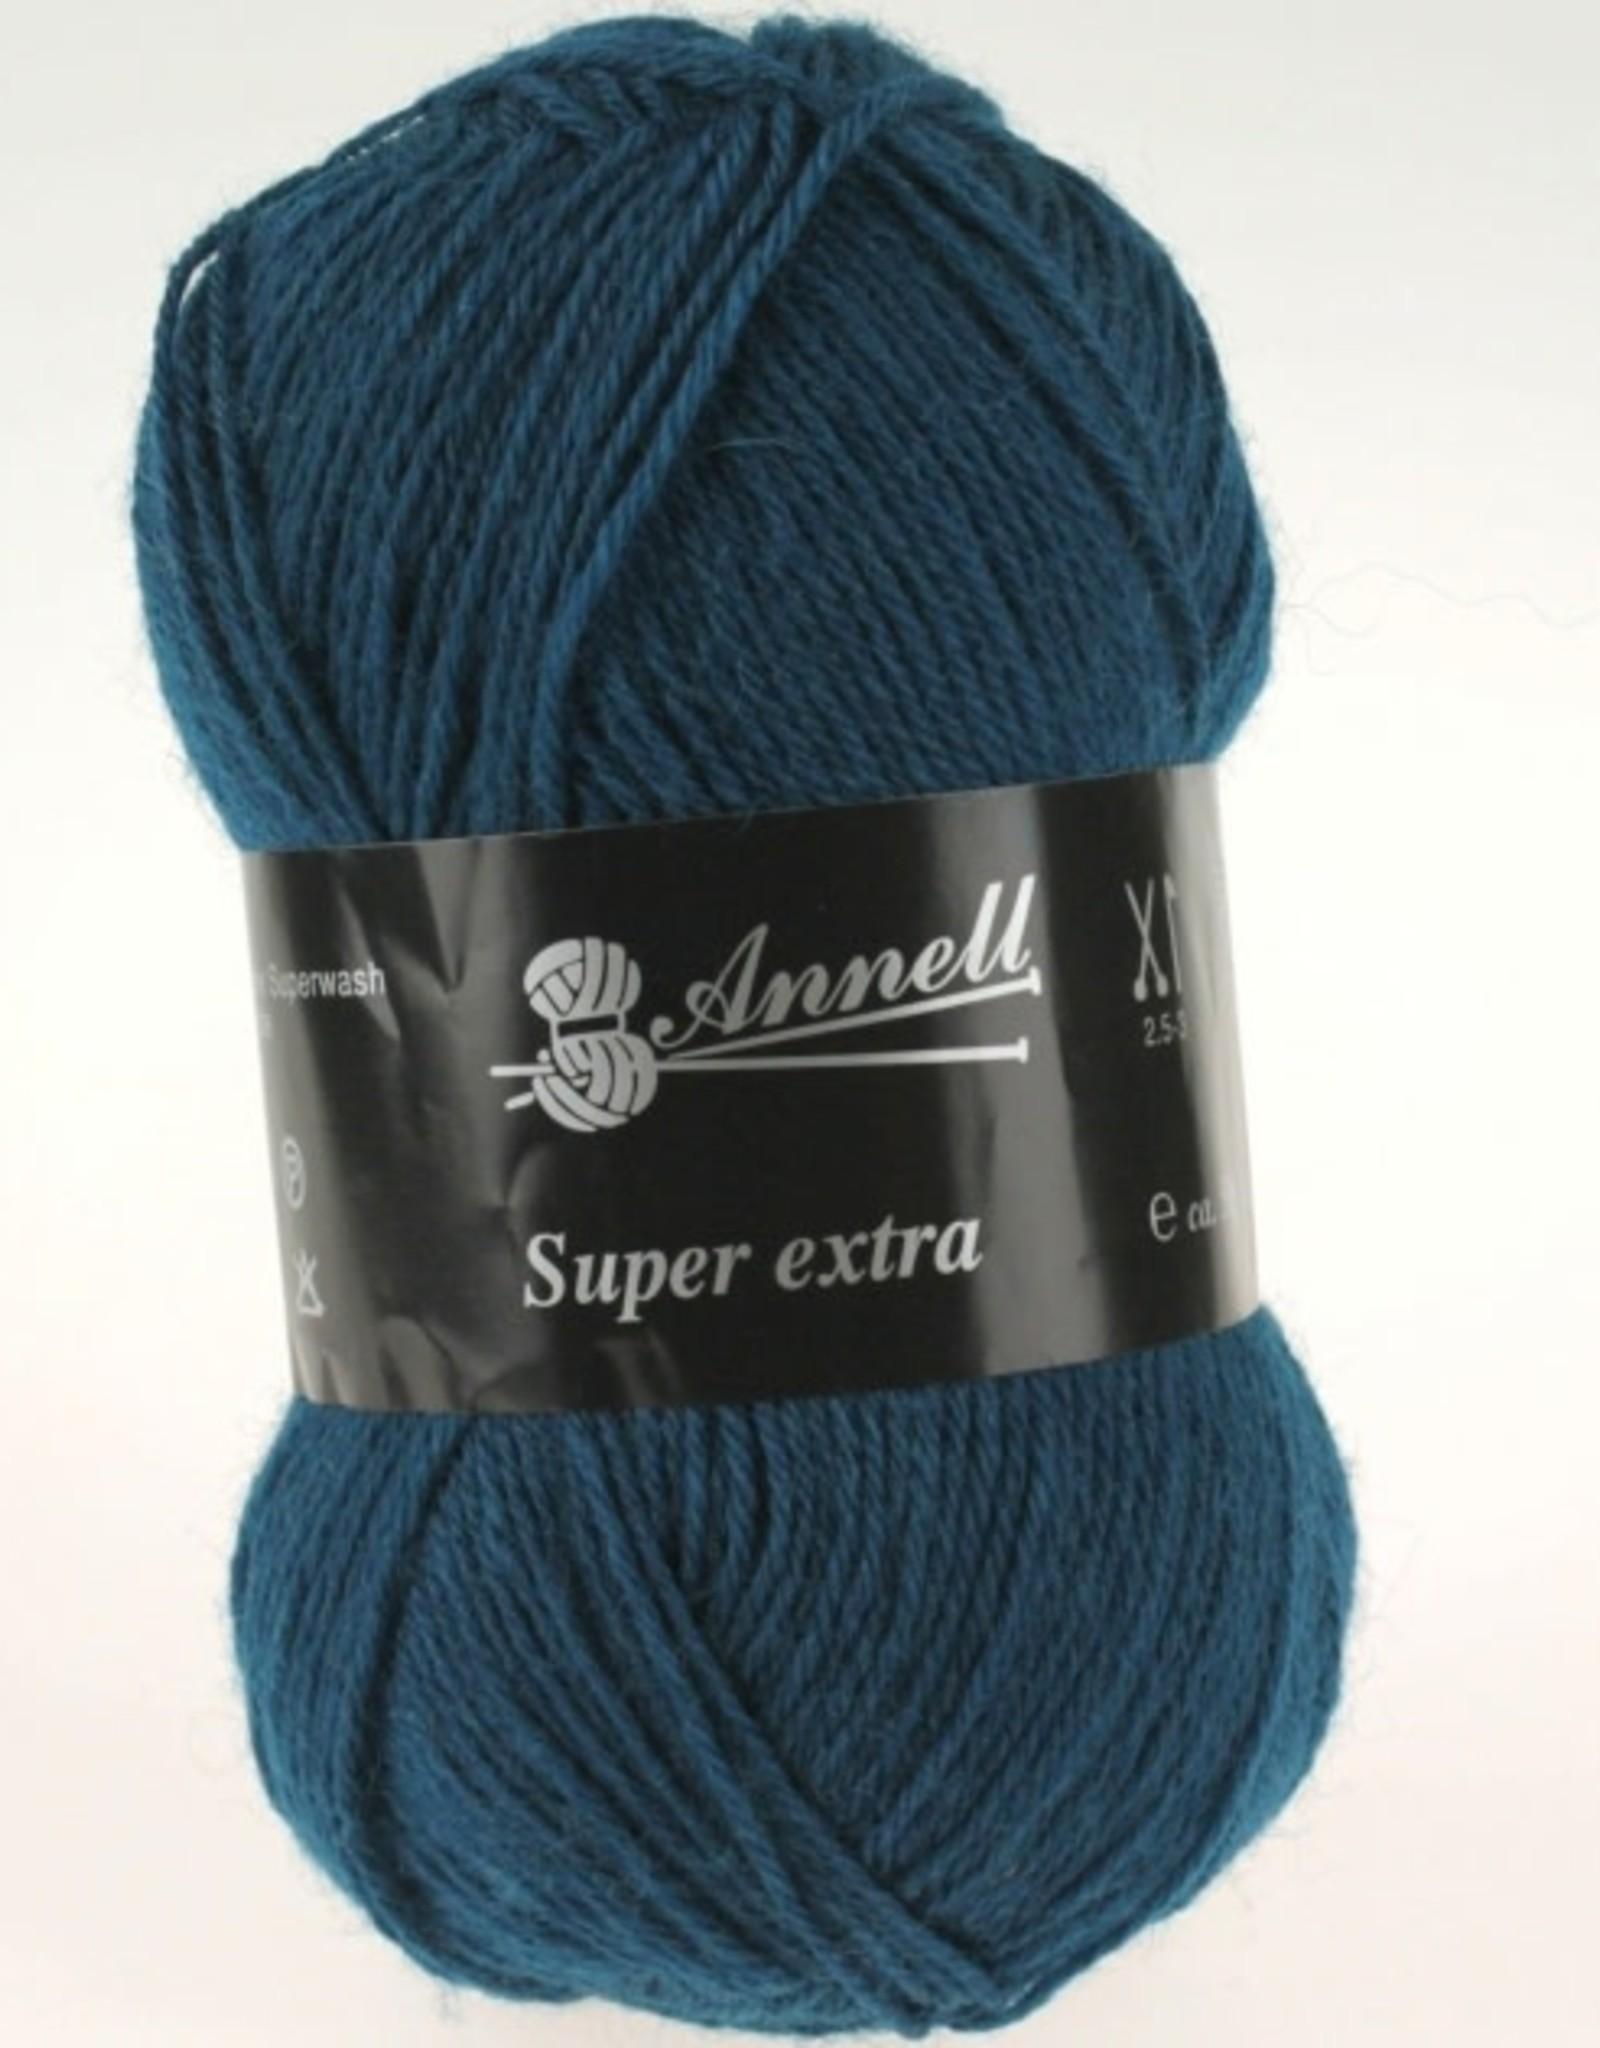 Annell Annell Super Extra Kleur 2041